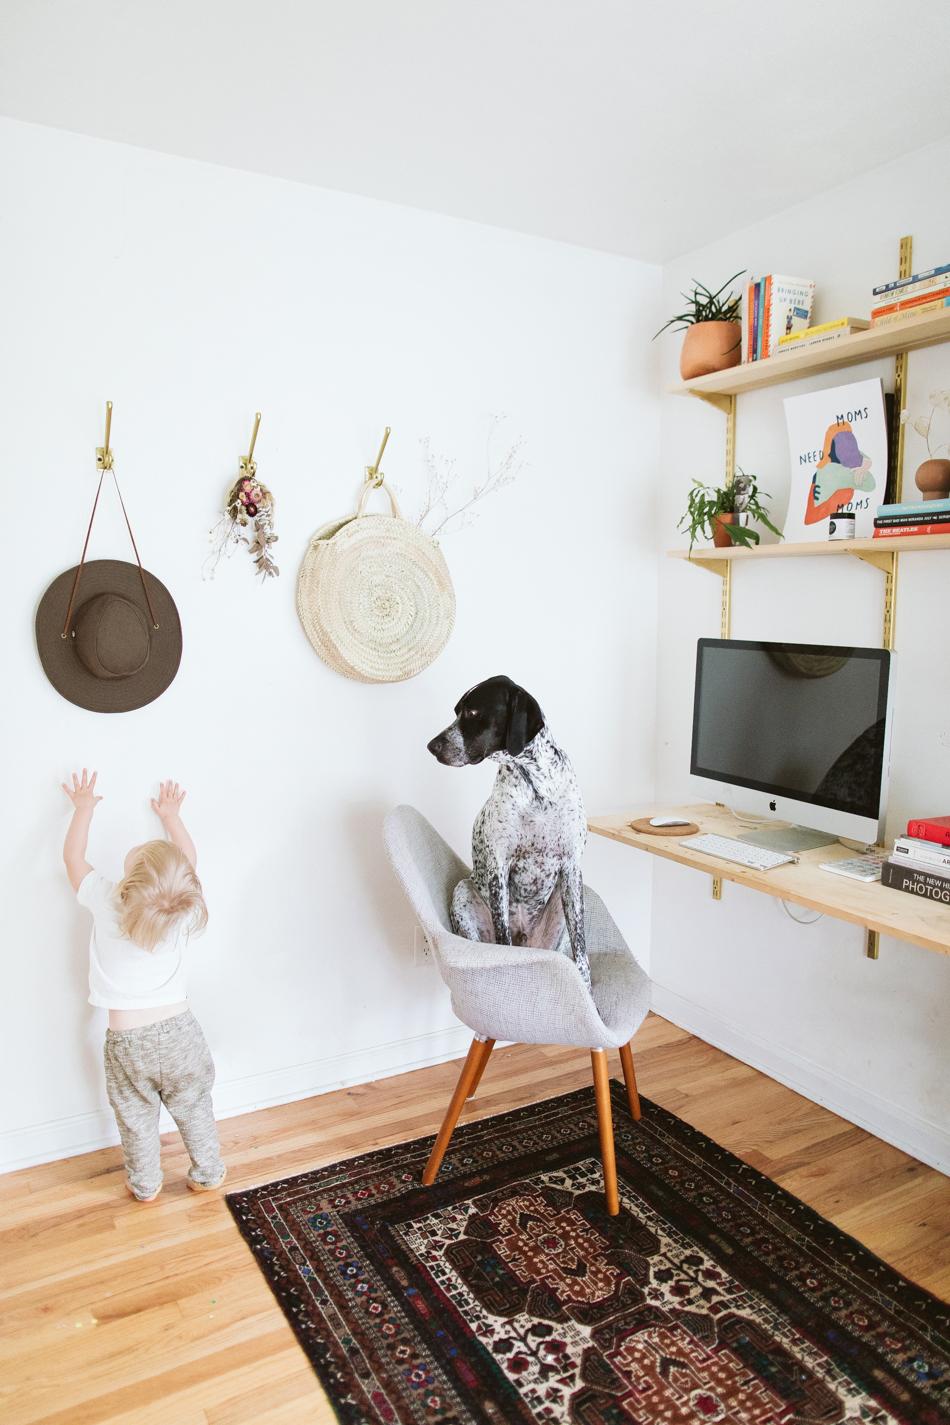 Photo and design by Paige Jones // www.paigejones.us